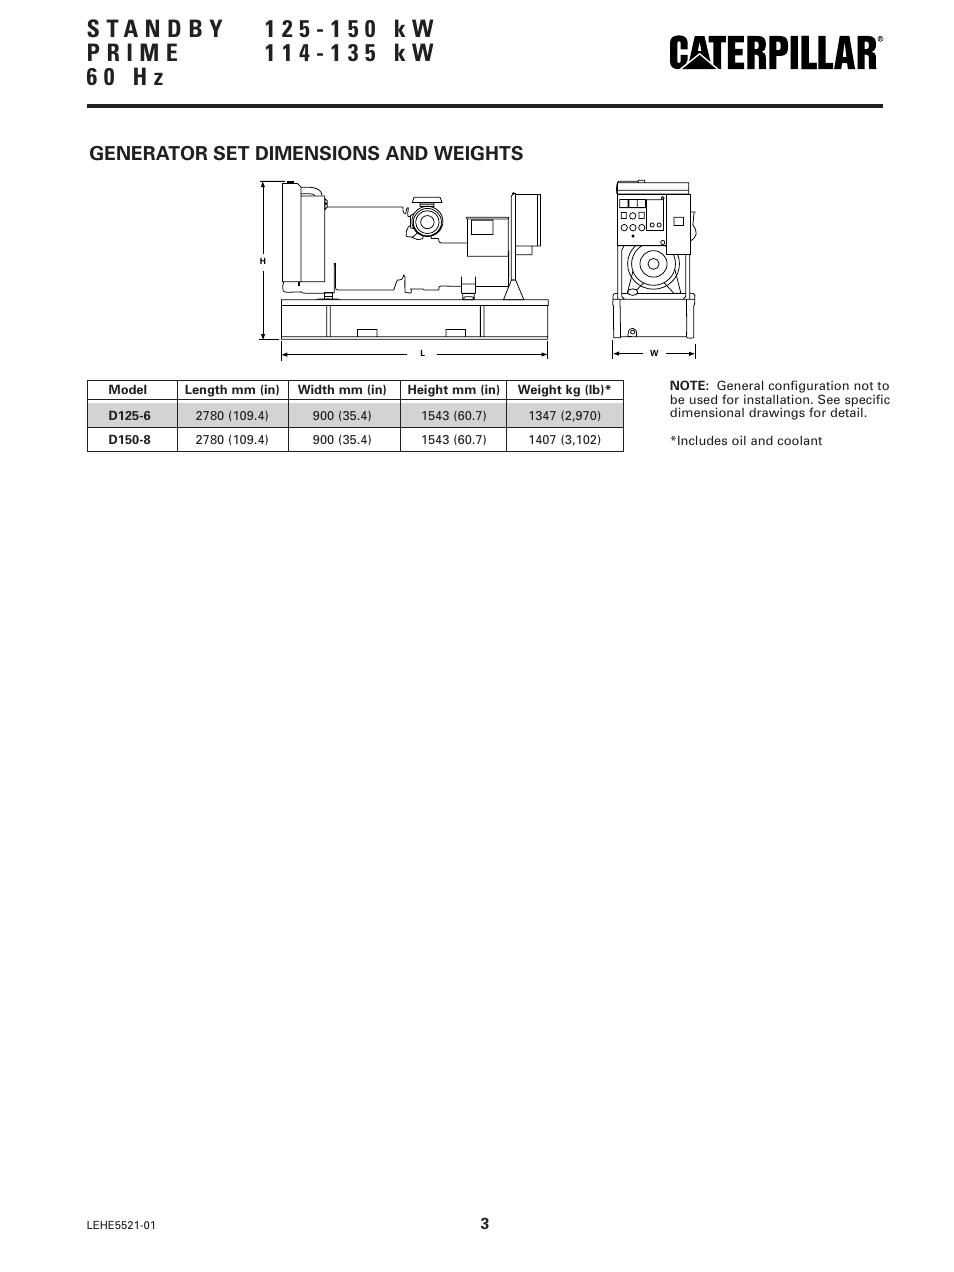 Caterpillar D1256 Wiring Diagram - ~ Wiring Diagram Portal ~ •